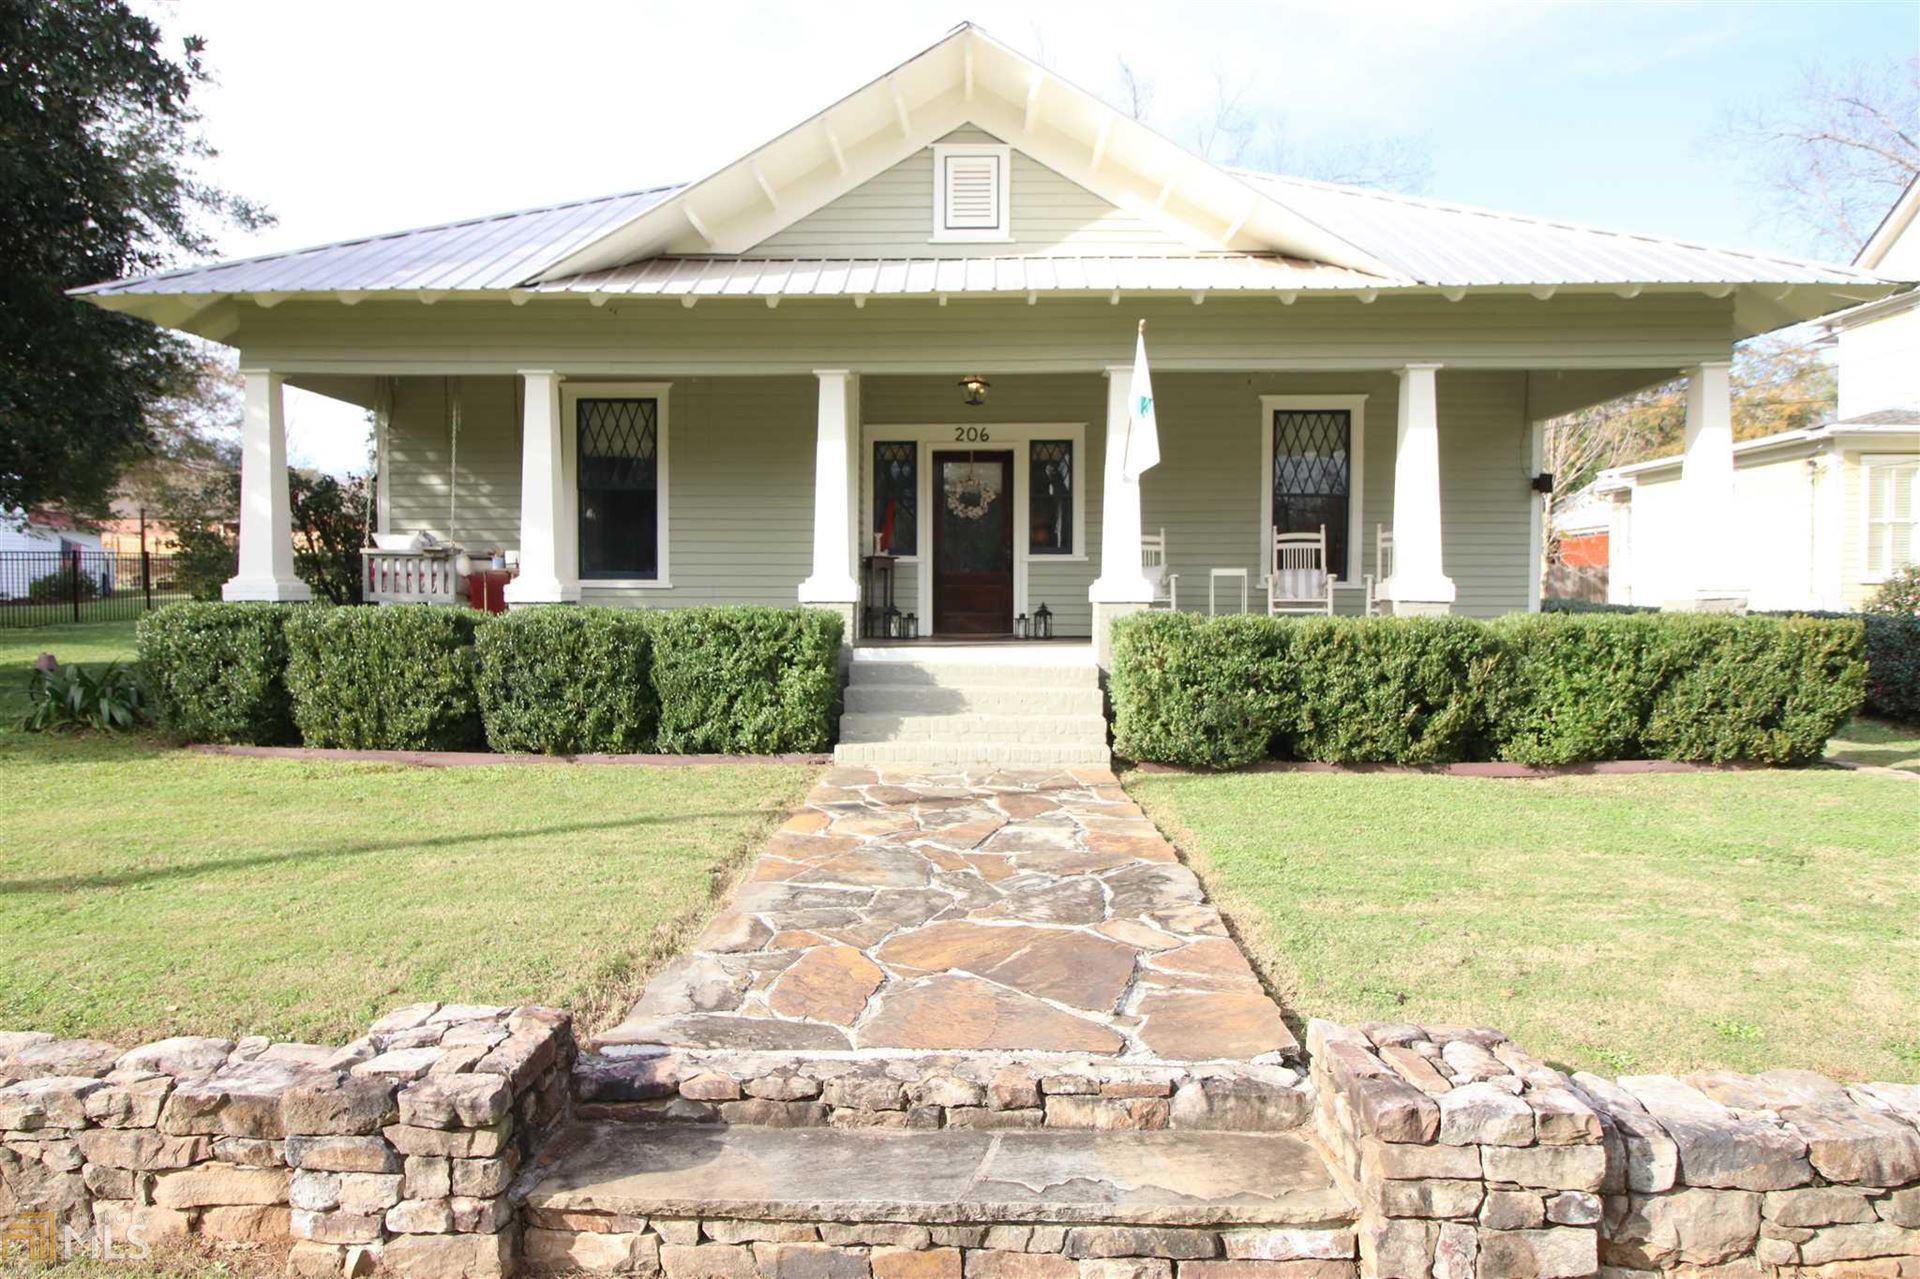 206 Elm St, Jefferson, GA 30549 - MLS#: 8904453